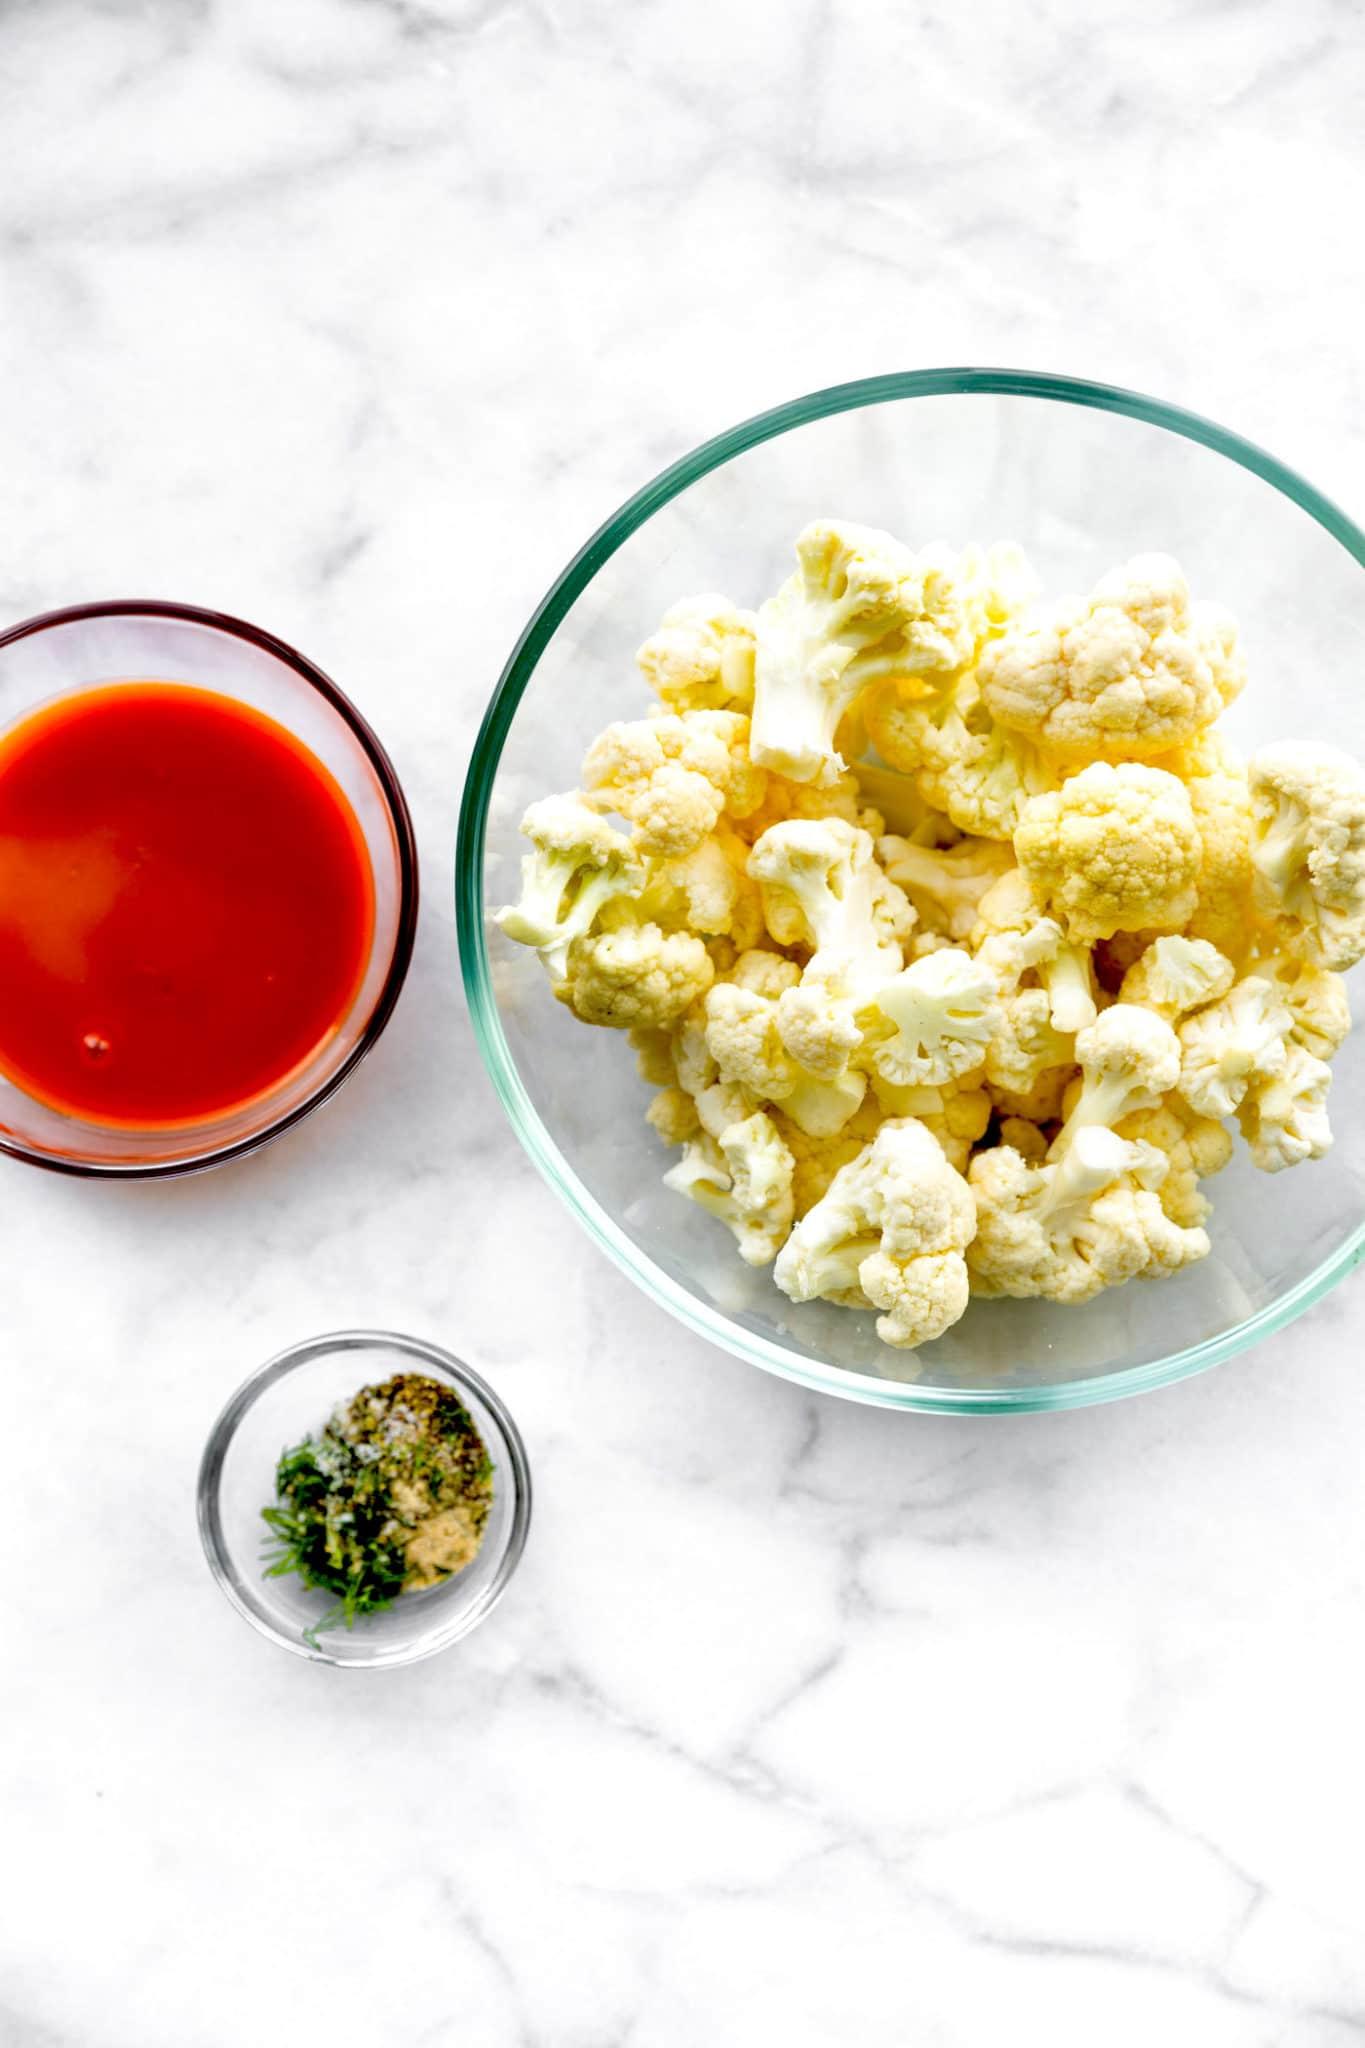 buffalo sauce, cauliflower florets, and seasonings